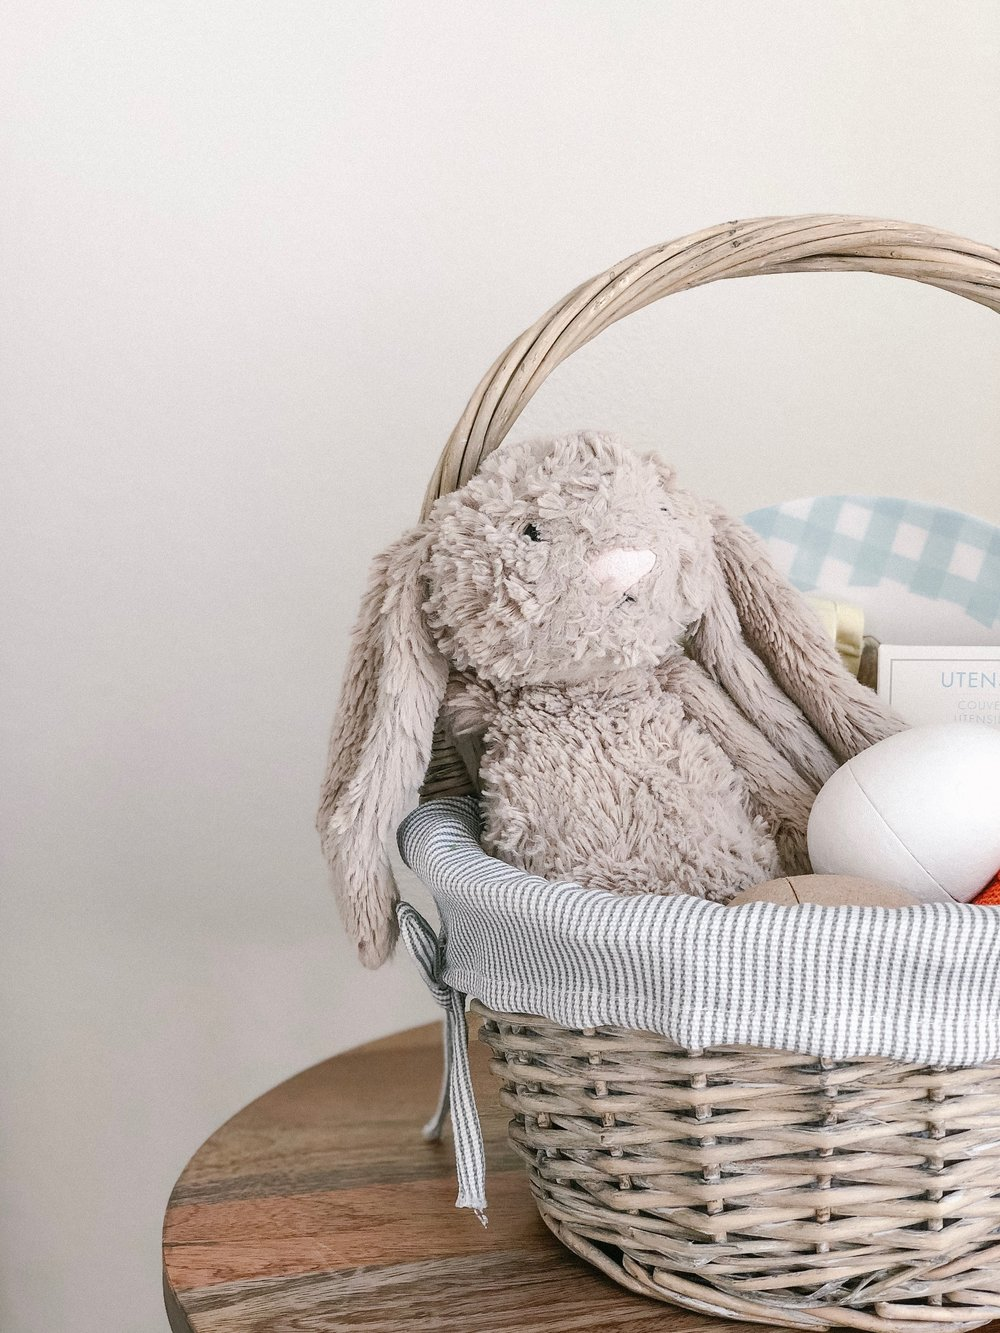 2019 Easter Basket Finds for your Tot | Victoria Austin